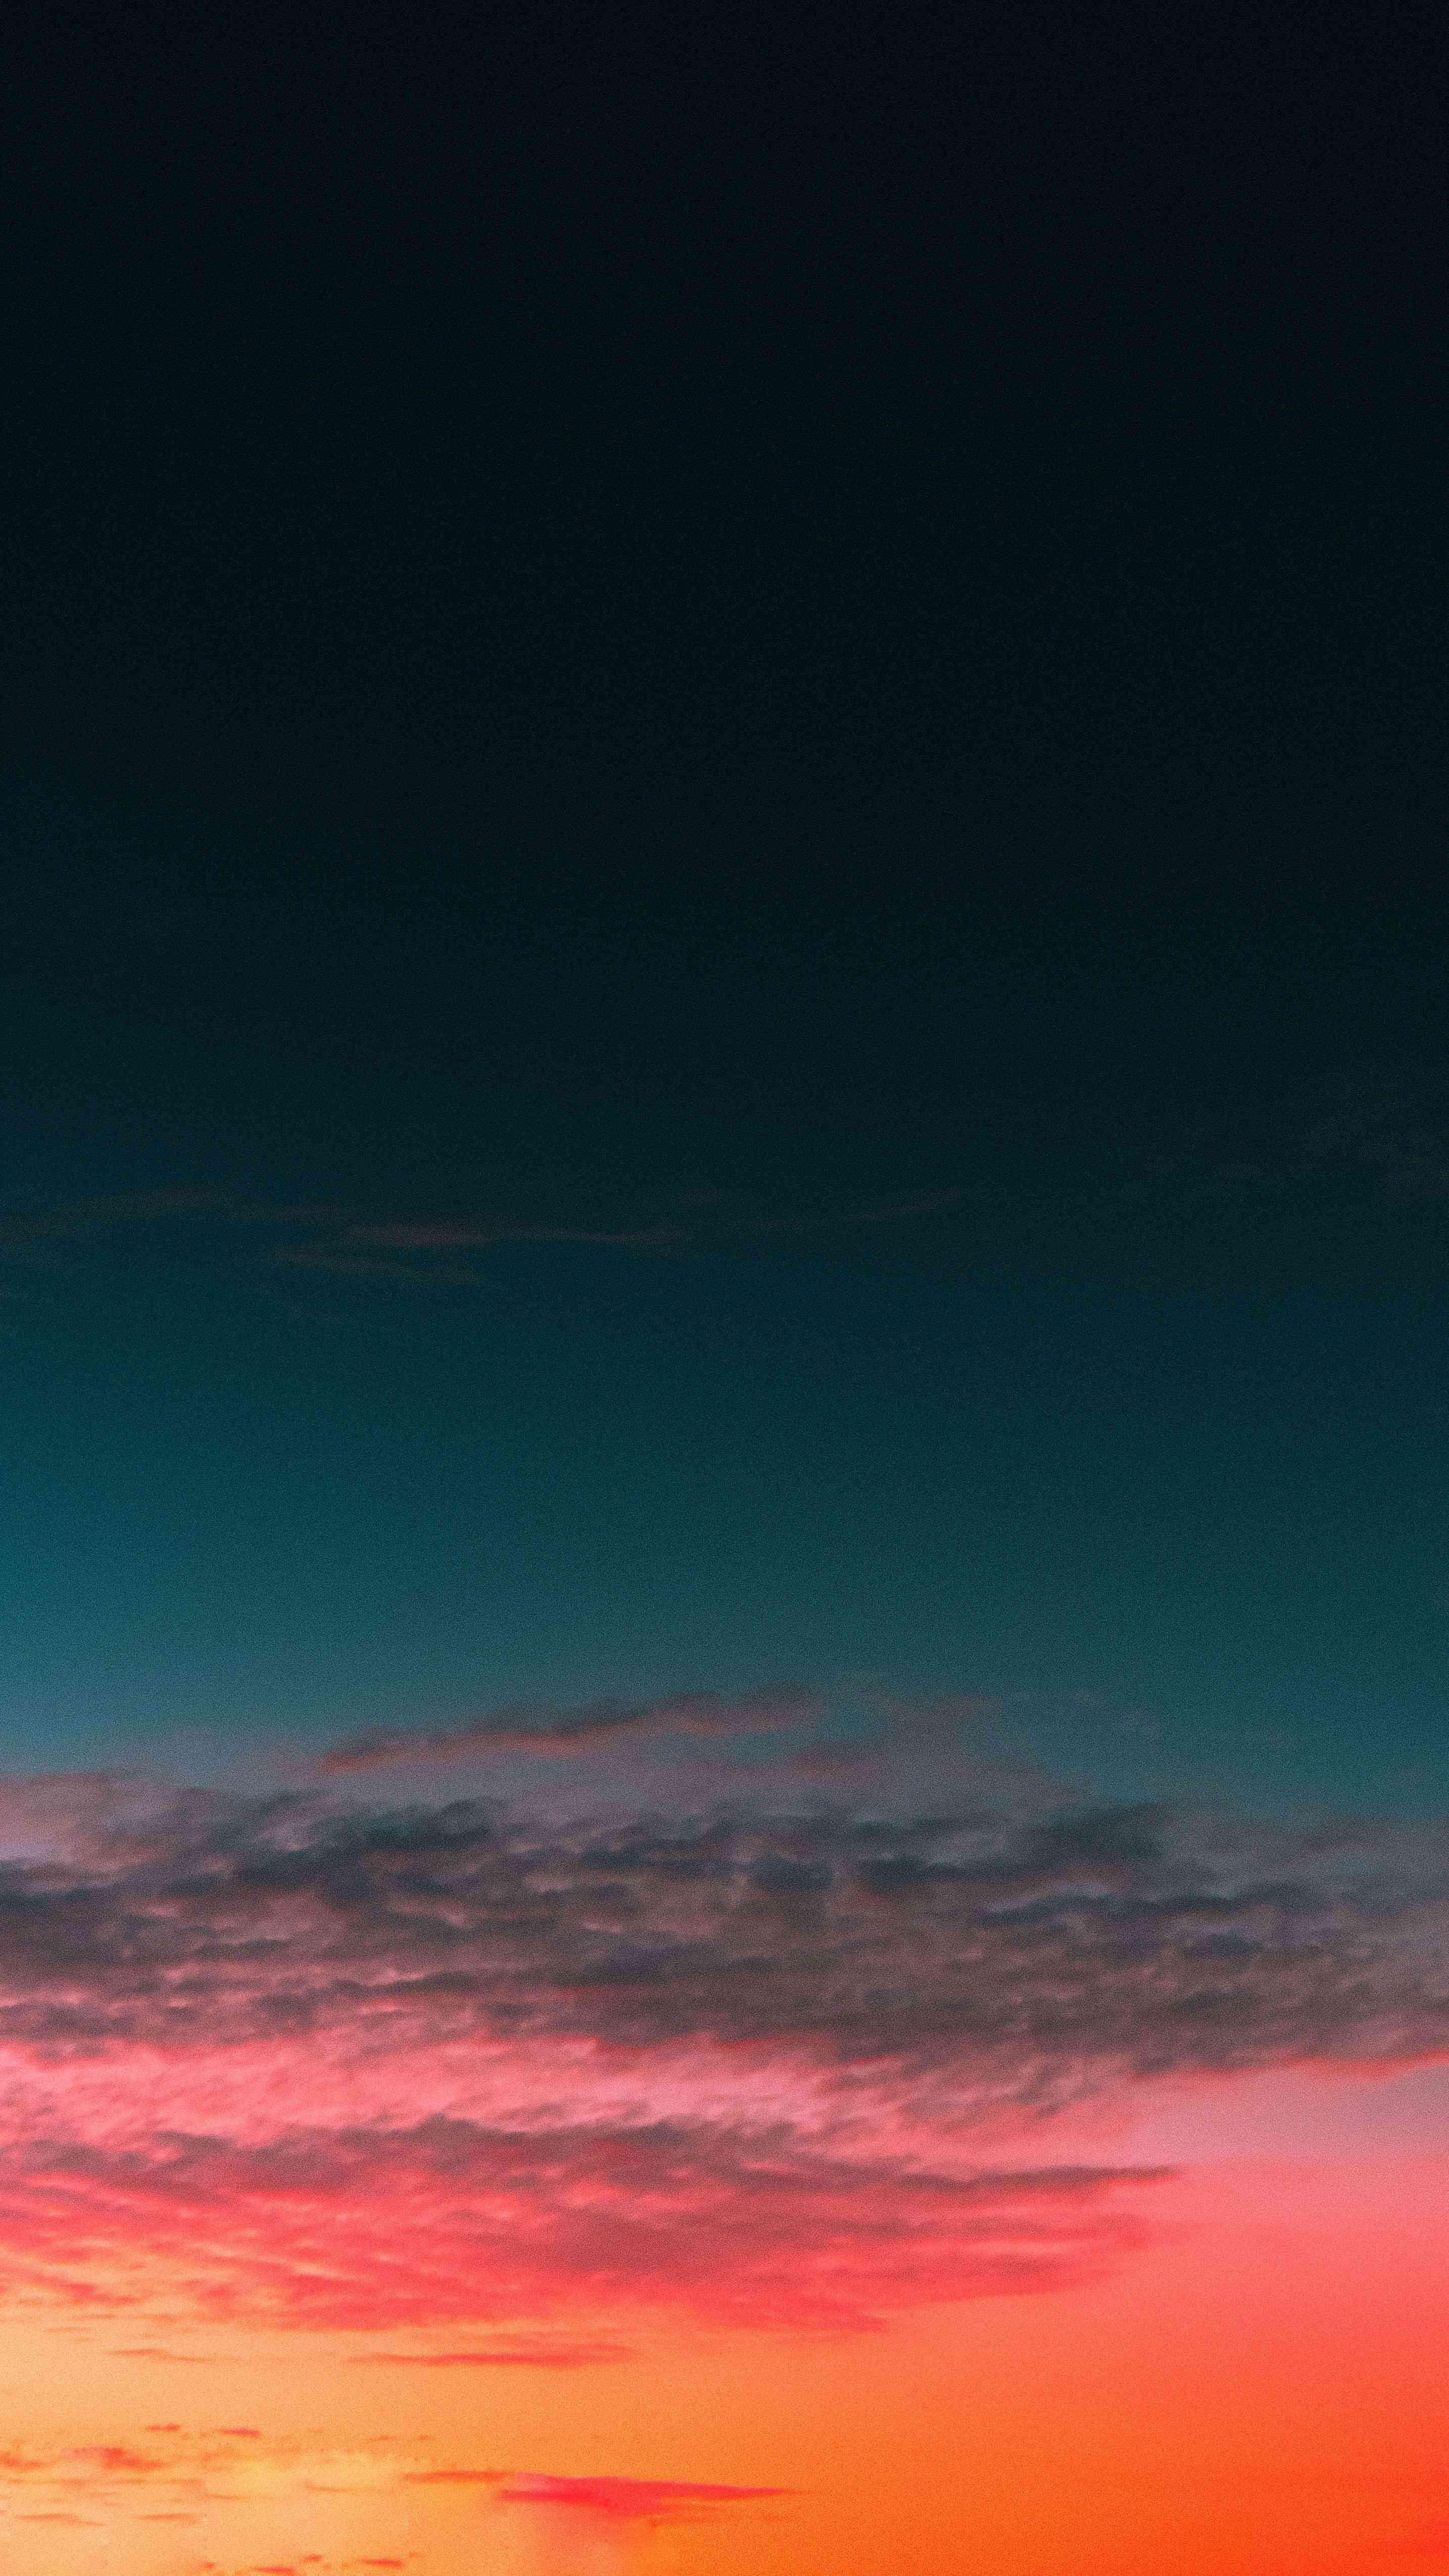 Sunset Sky Clouds iPhone Wallpaper